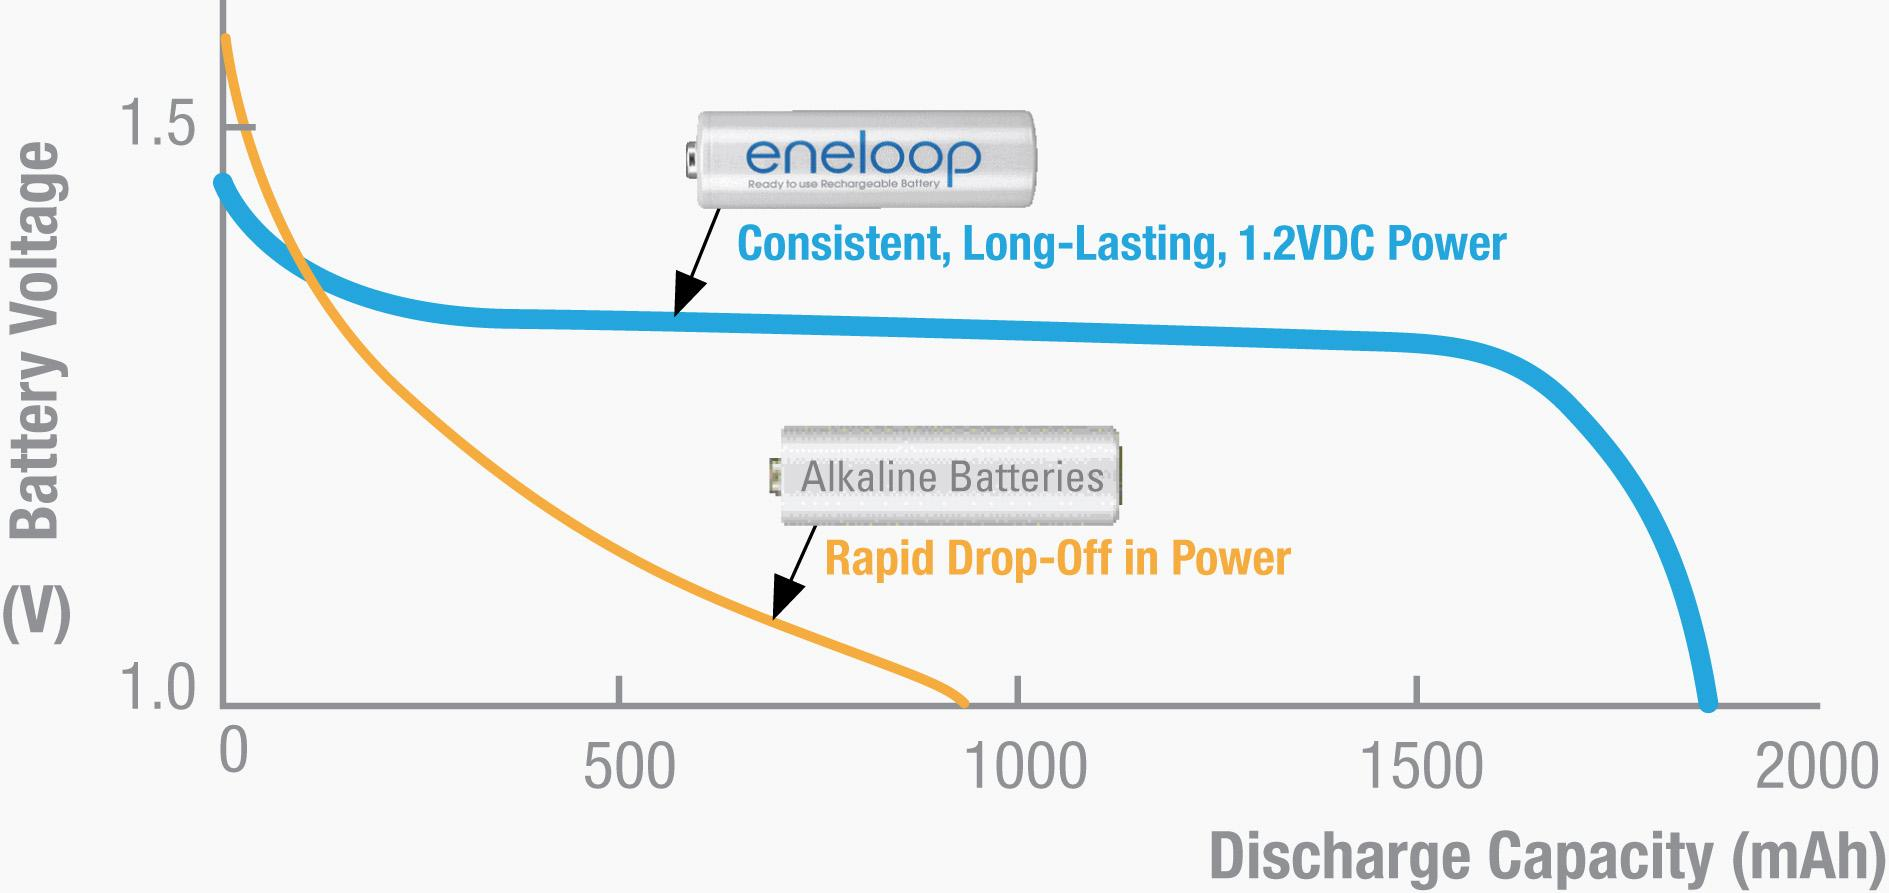 4 AA eneloop 2nd Generation Rechargeable Batteries (AAx4